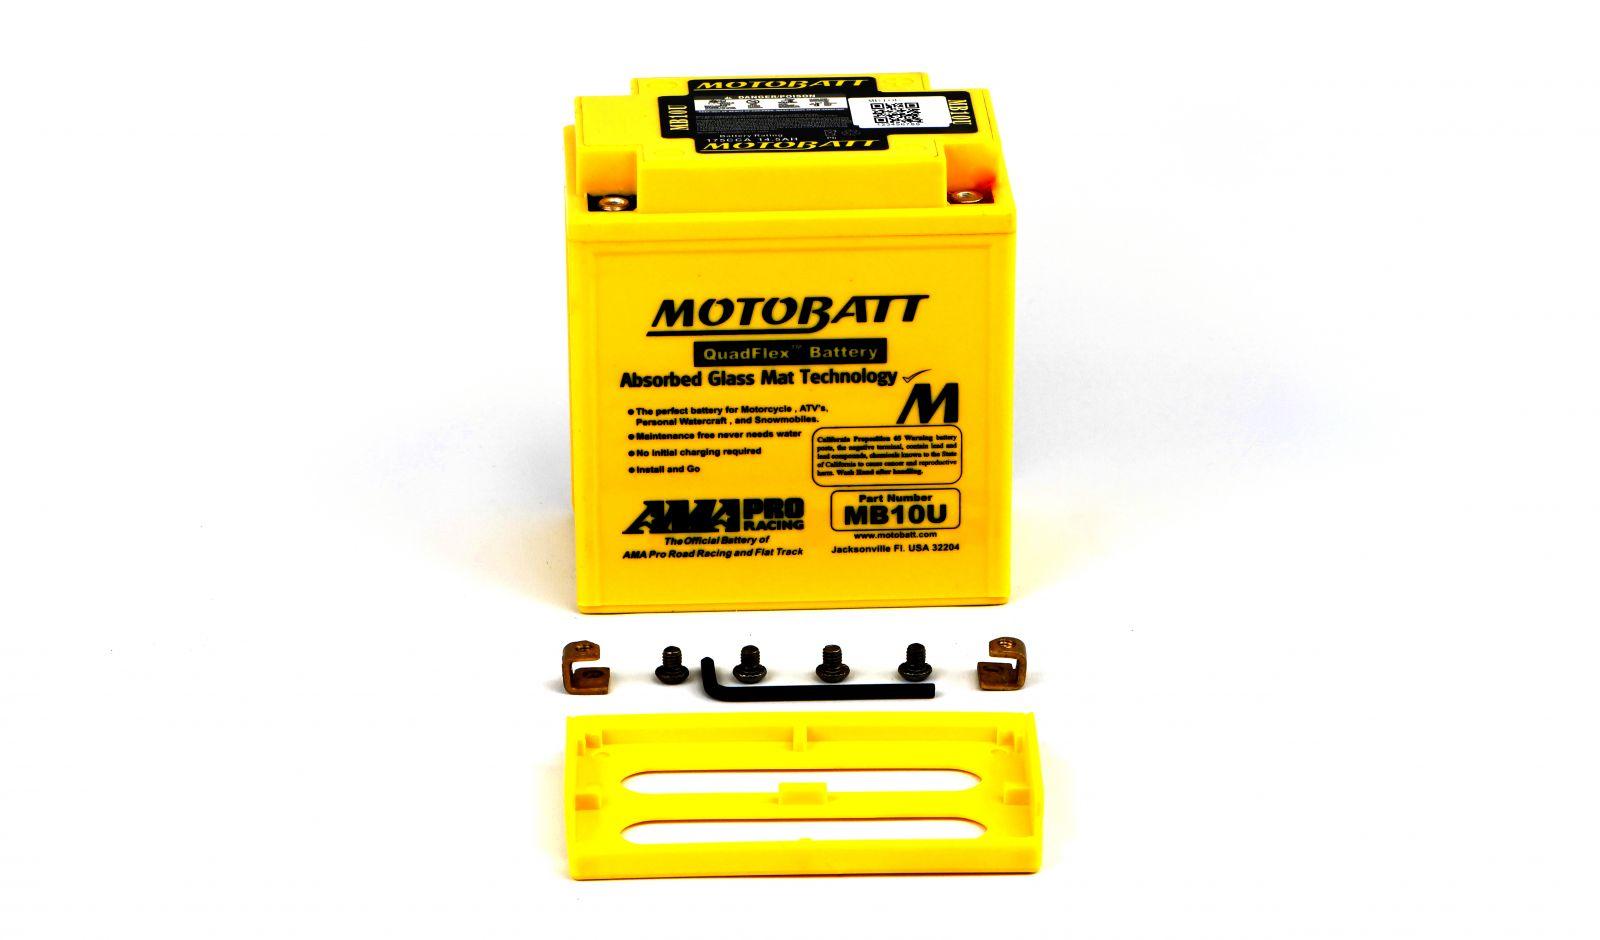 Motobatt Batteries - 501102MY image